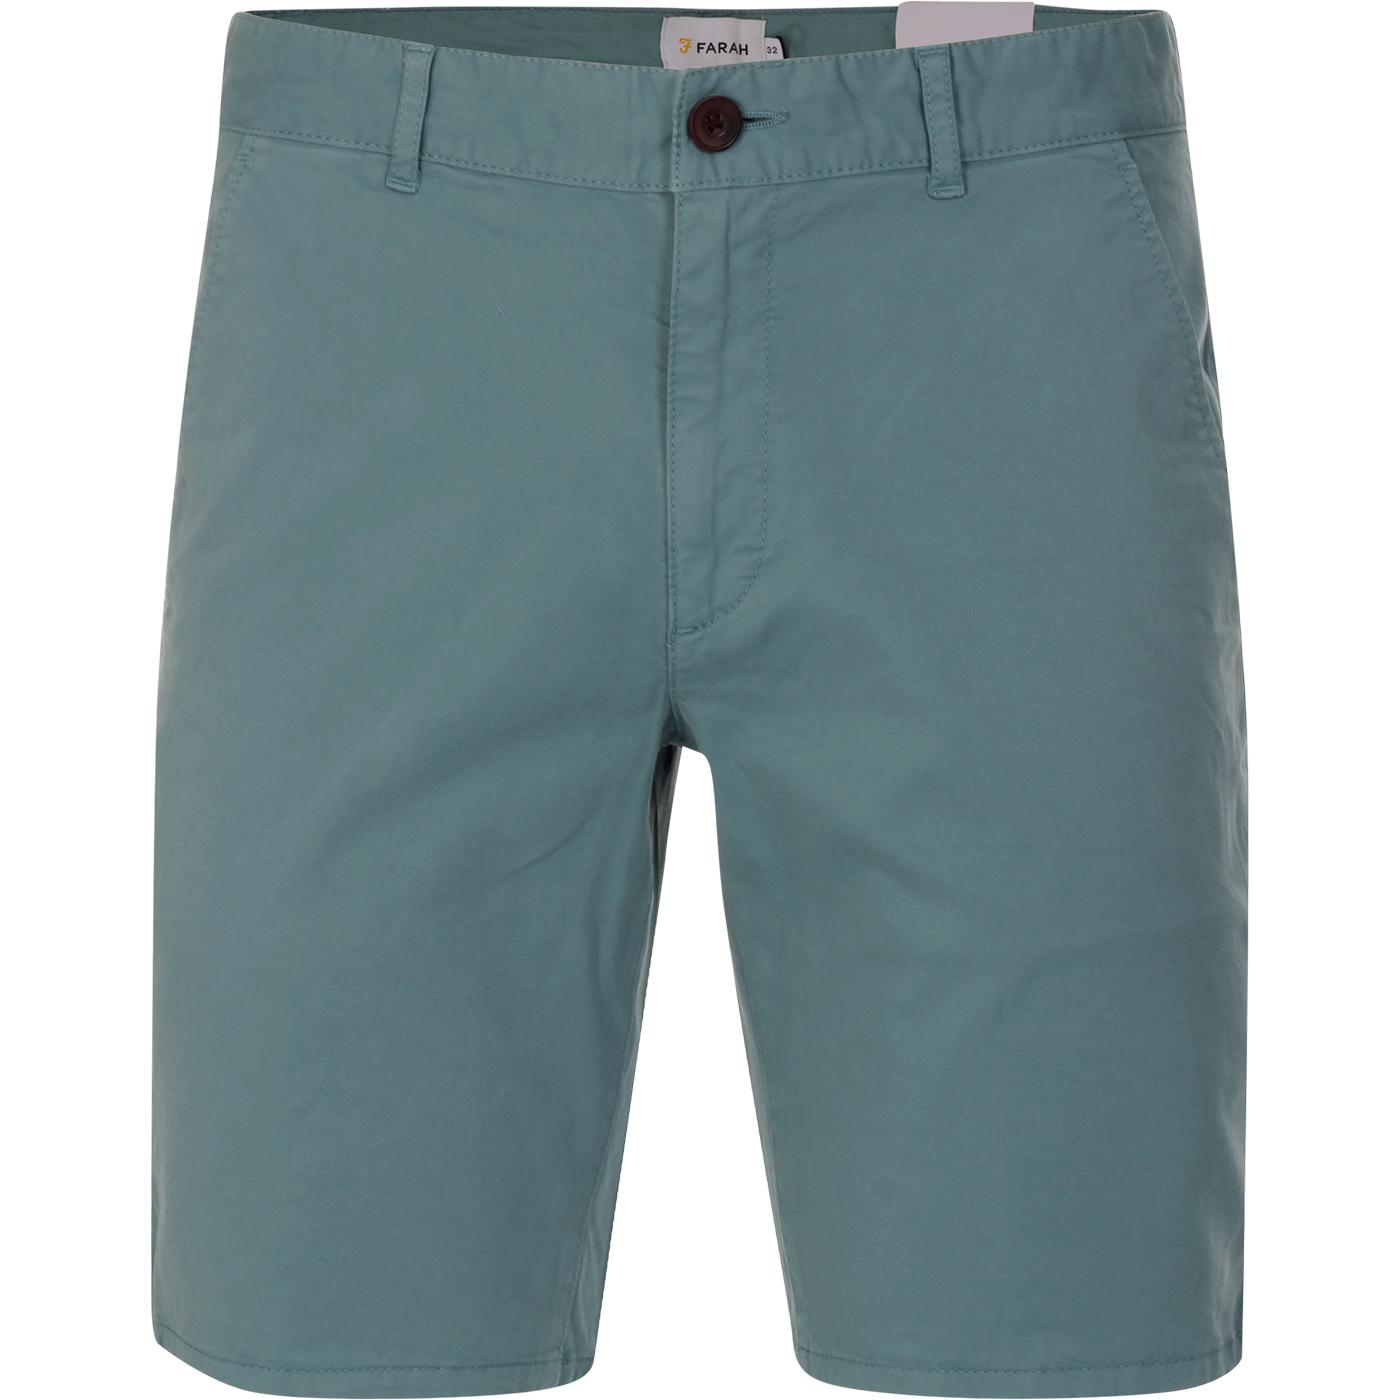 Hawk FARAH Retro Garment Dye Chino Shorts (RG)